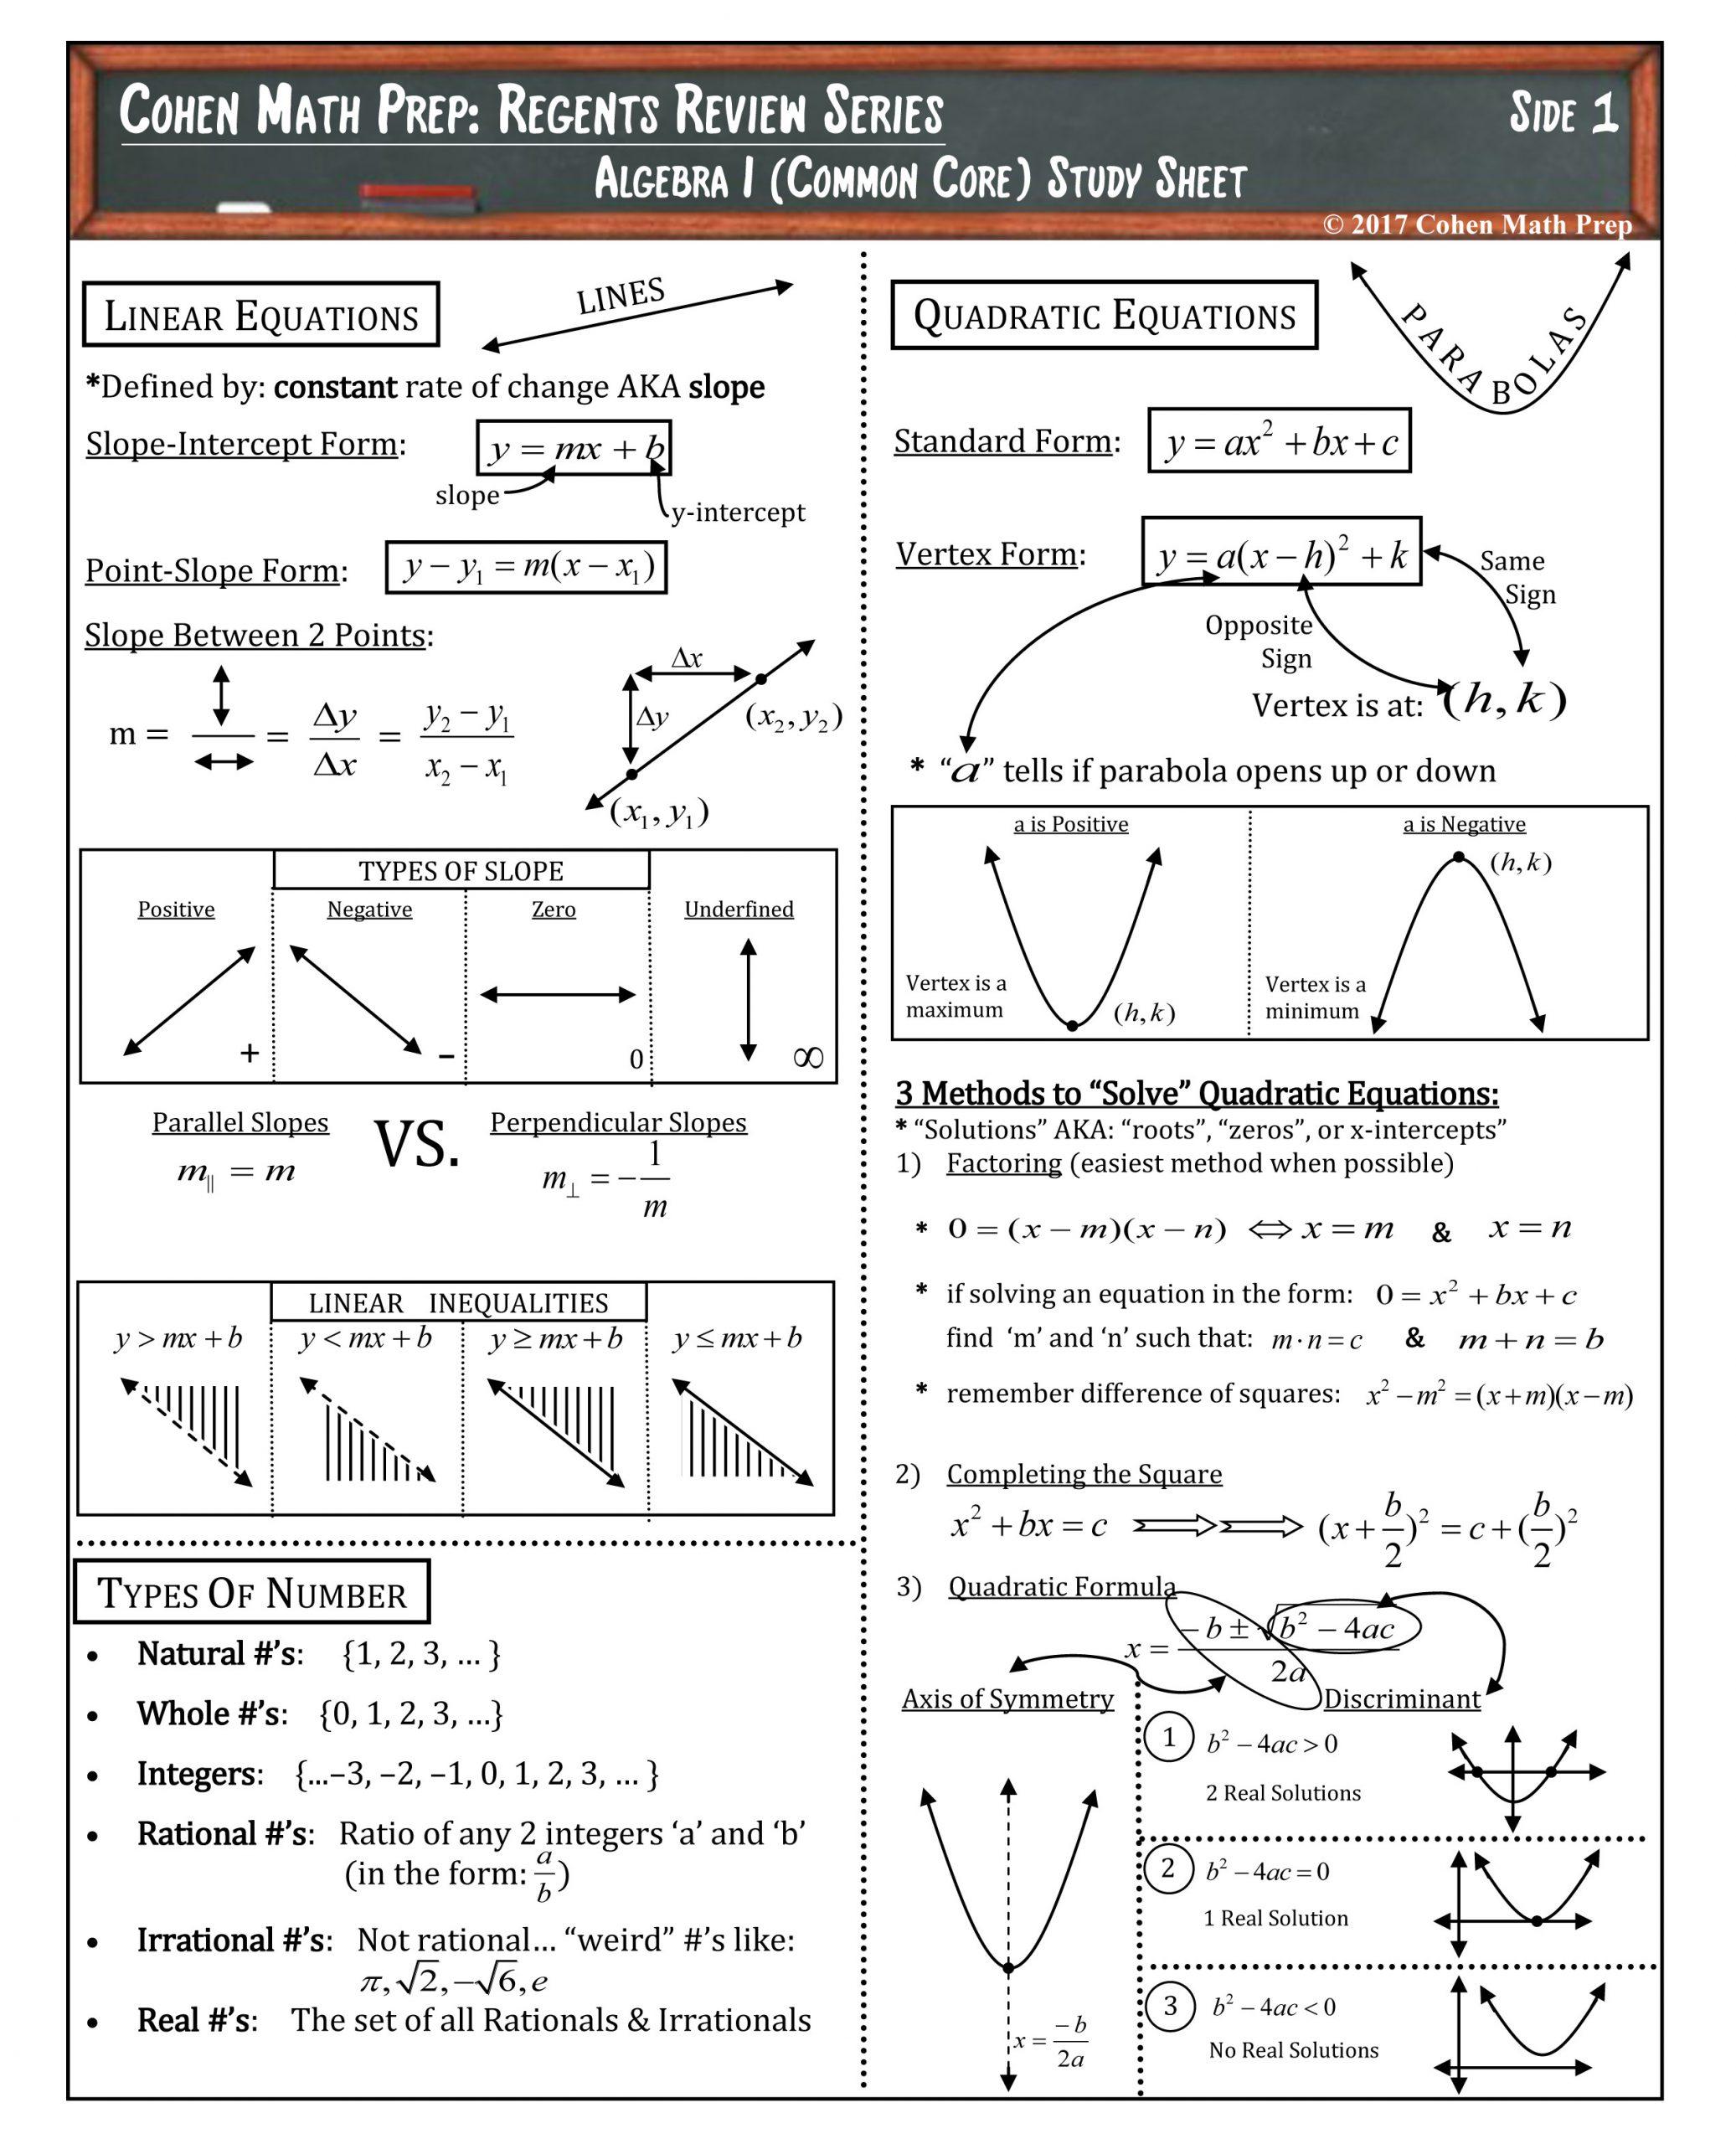 Algebra 1 Review Worksheet Algebra 1 Mon Core Review Worksheets